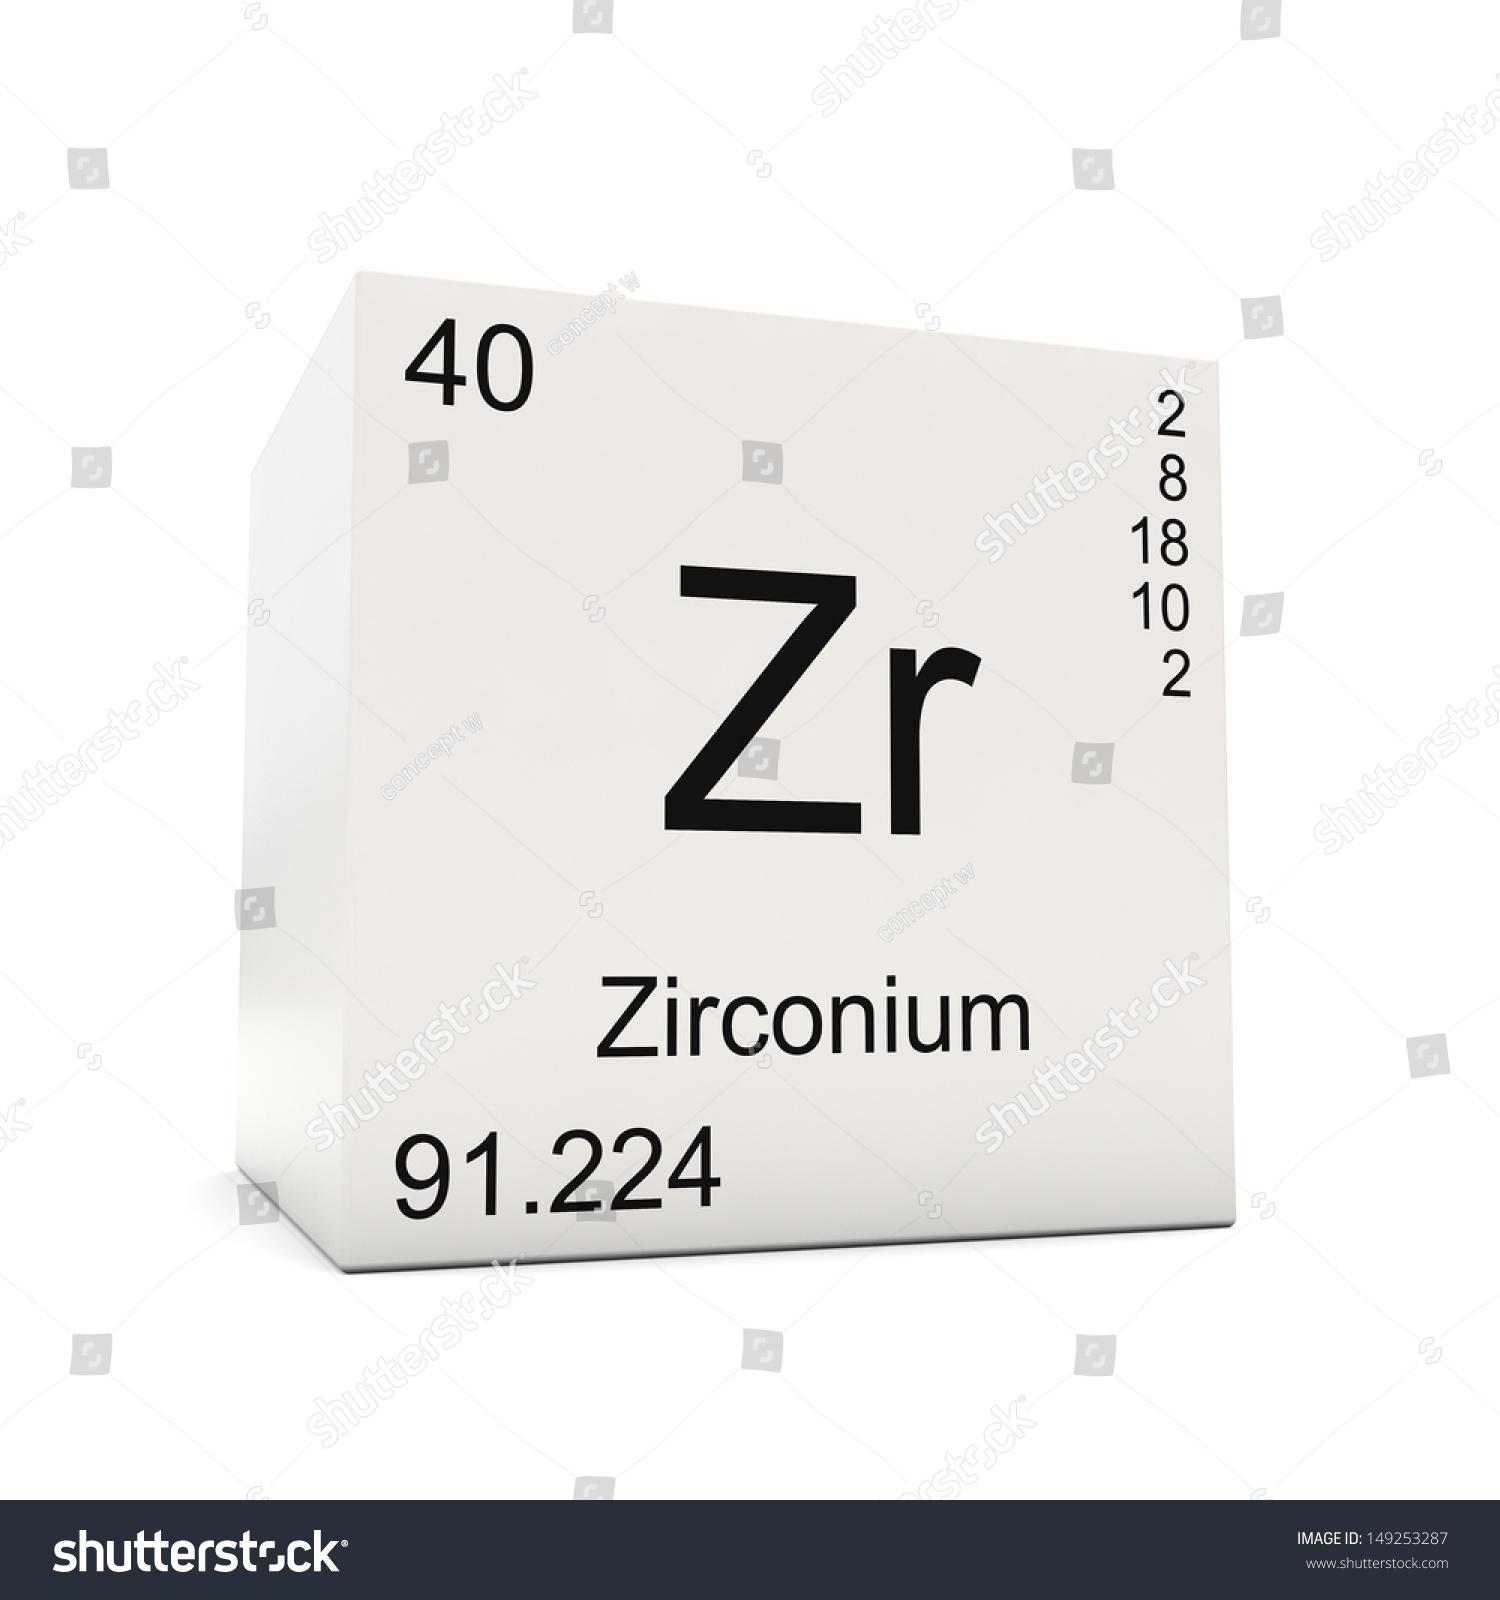 Cube zirconium element periodic table isolated stock illustration cube of zirconium element of the periodic table isolated on white background gamestrikefo Images